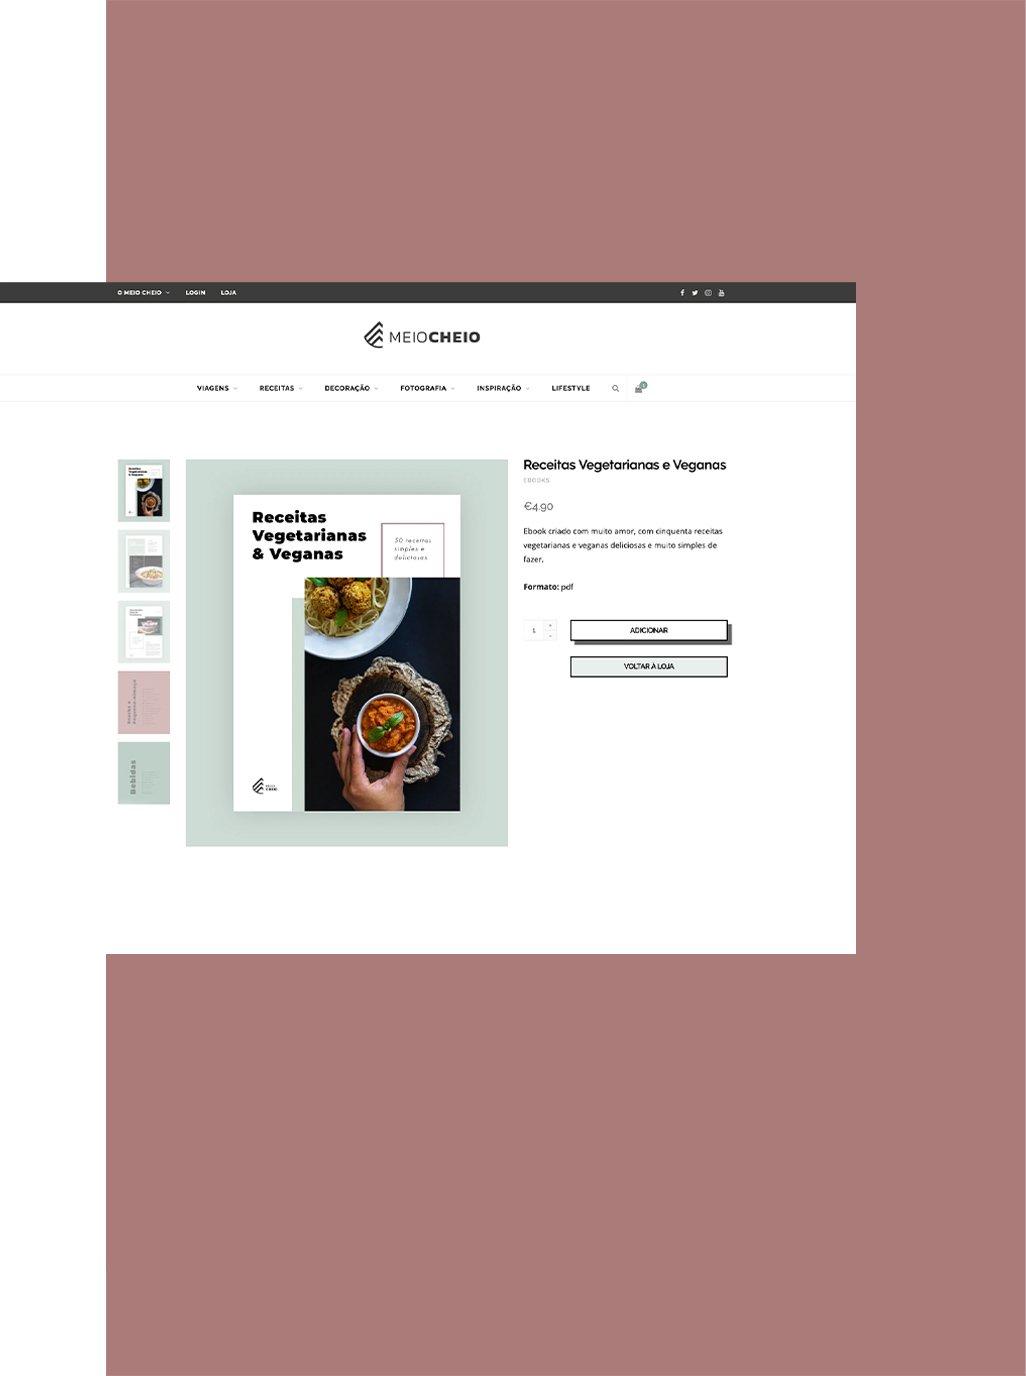 Product Page - Online Shop | Ecommerce | Meio Cheio